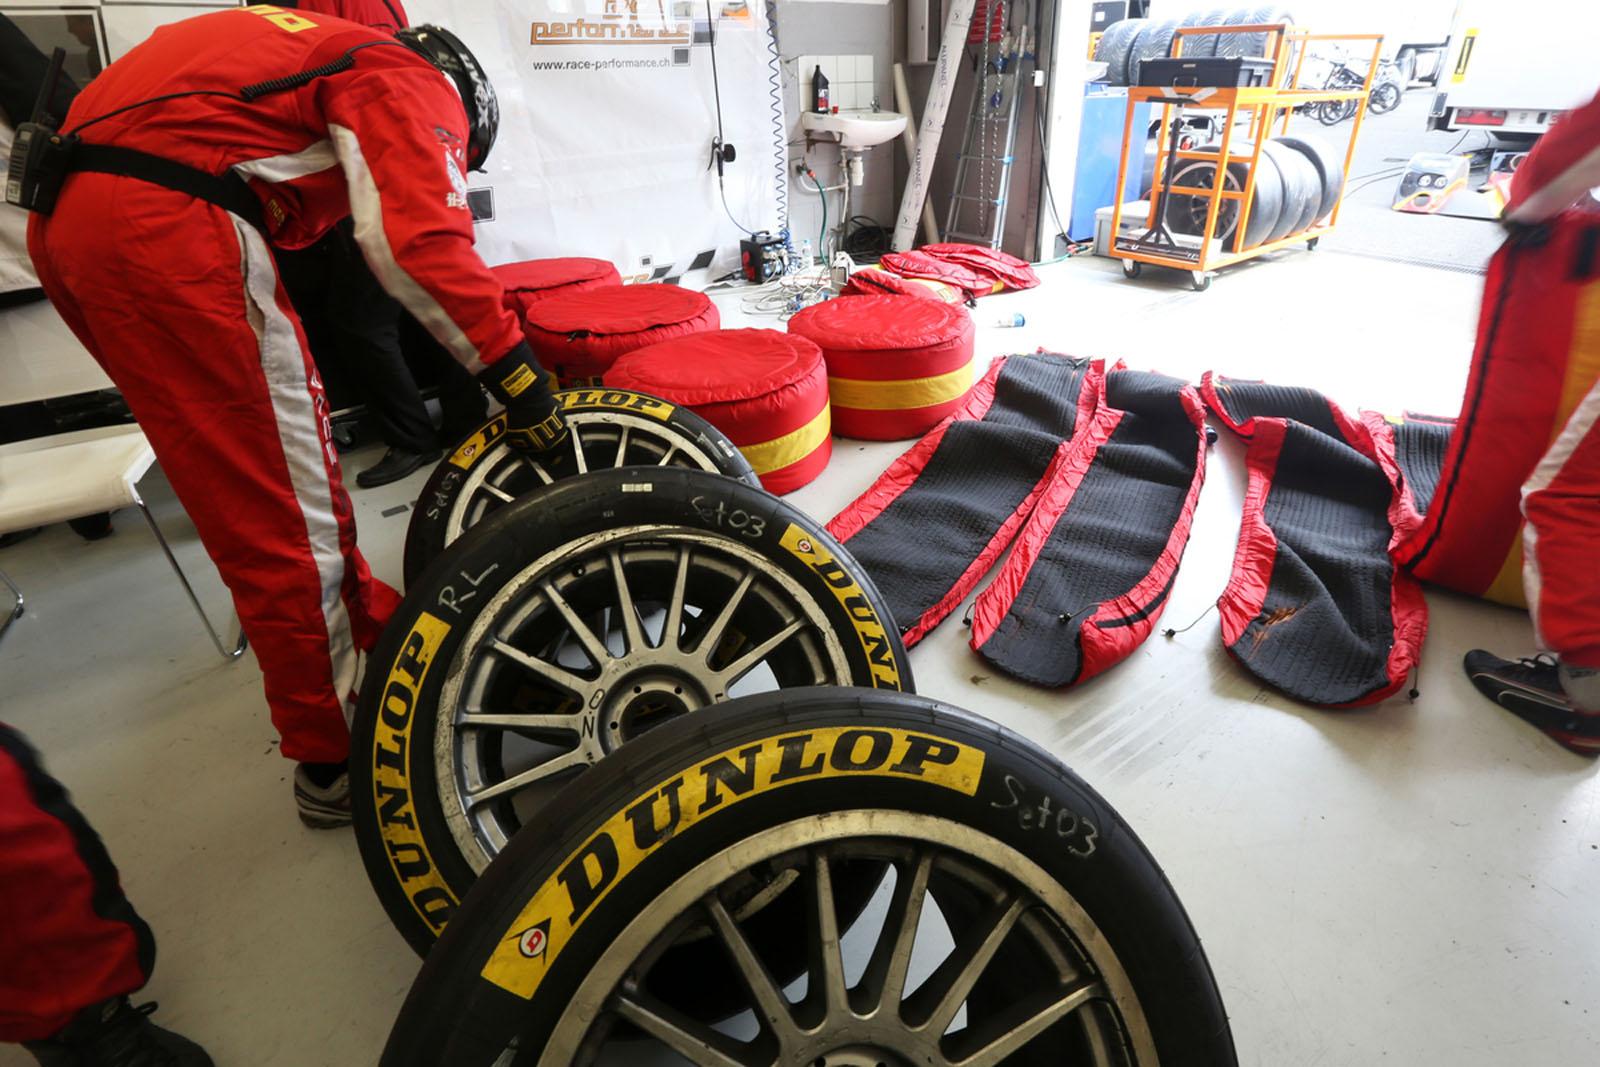 Le Mans , performanțele Dunlop în cifre